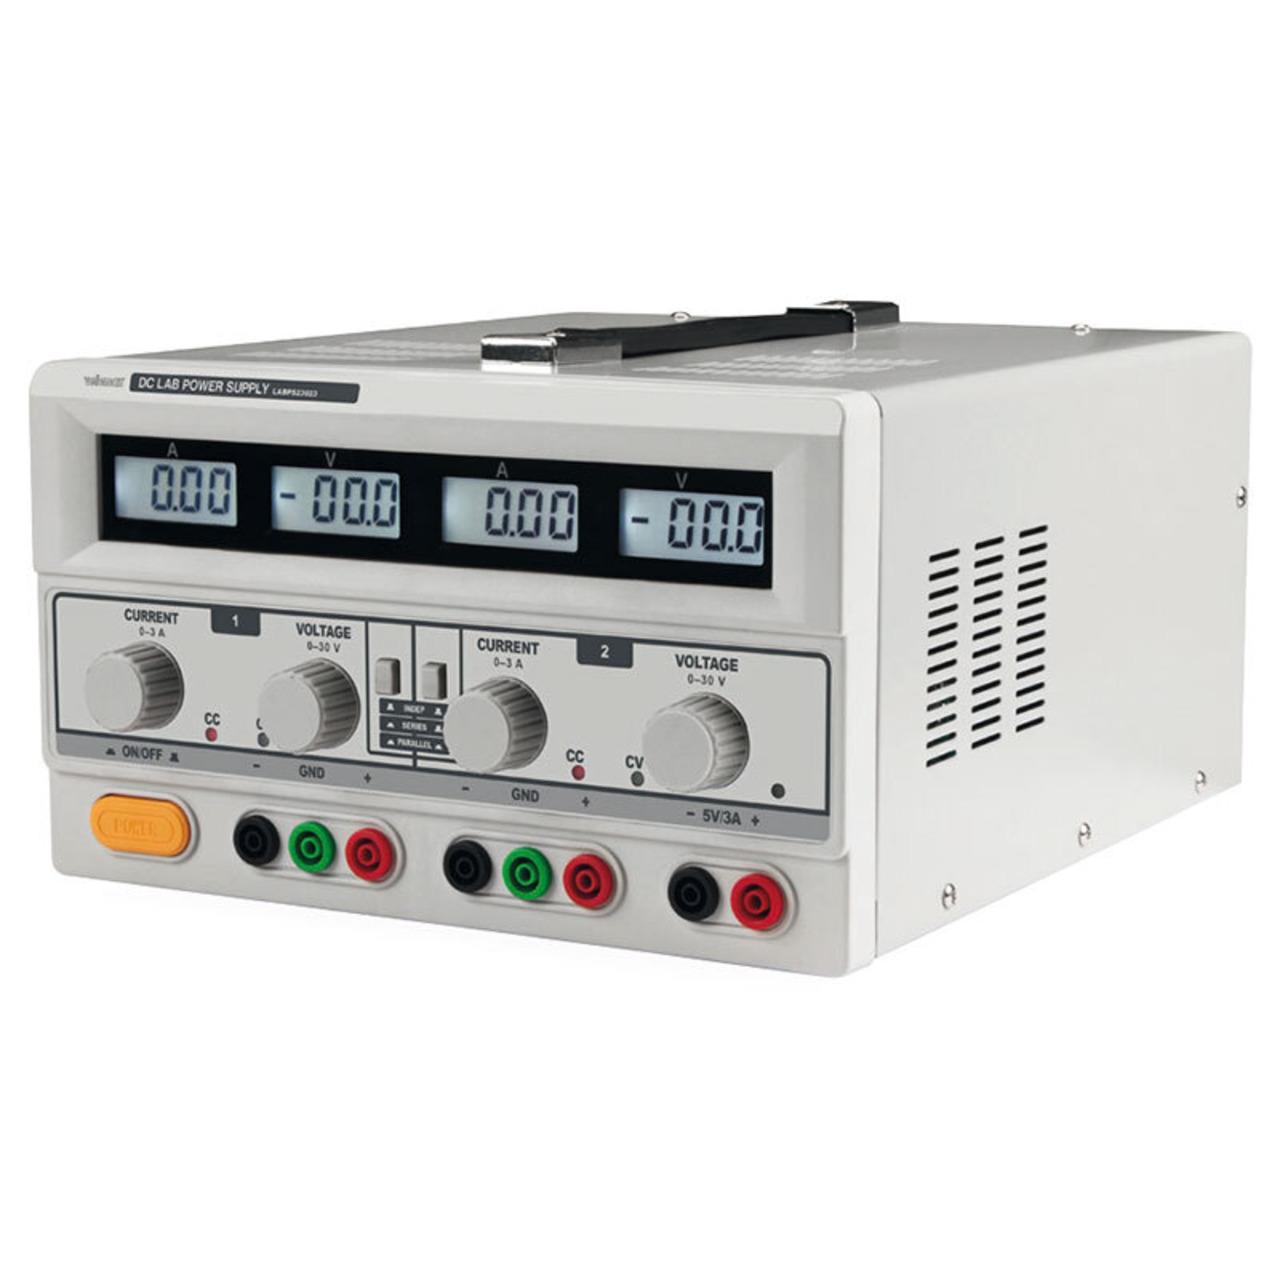 Velleman Labornetzgerät LABPS23023 0–30 V/3 A mit 4 LC-Displays